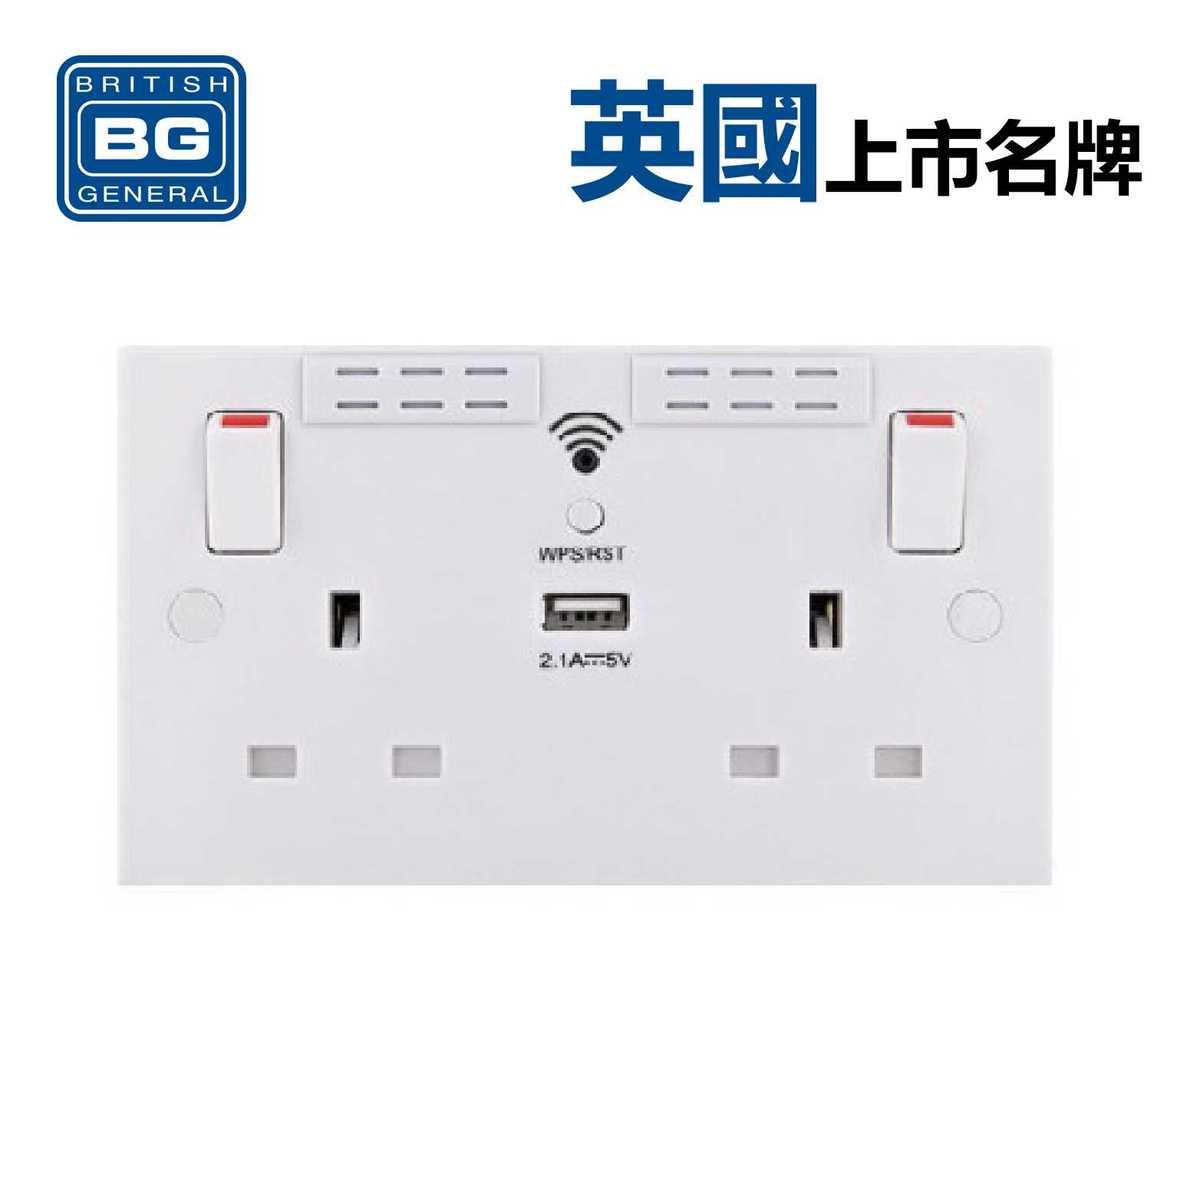 1USB 2.1A雙位有掣13A 無線信號延伸器插座/蘇底-白色 (型號:922UWR)